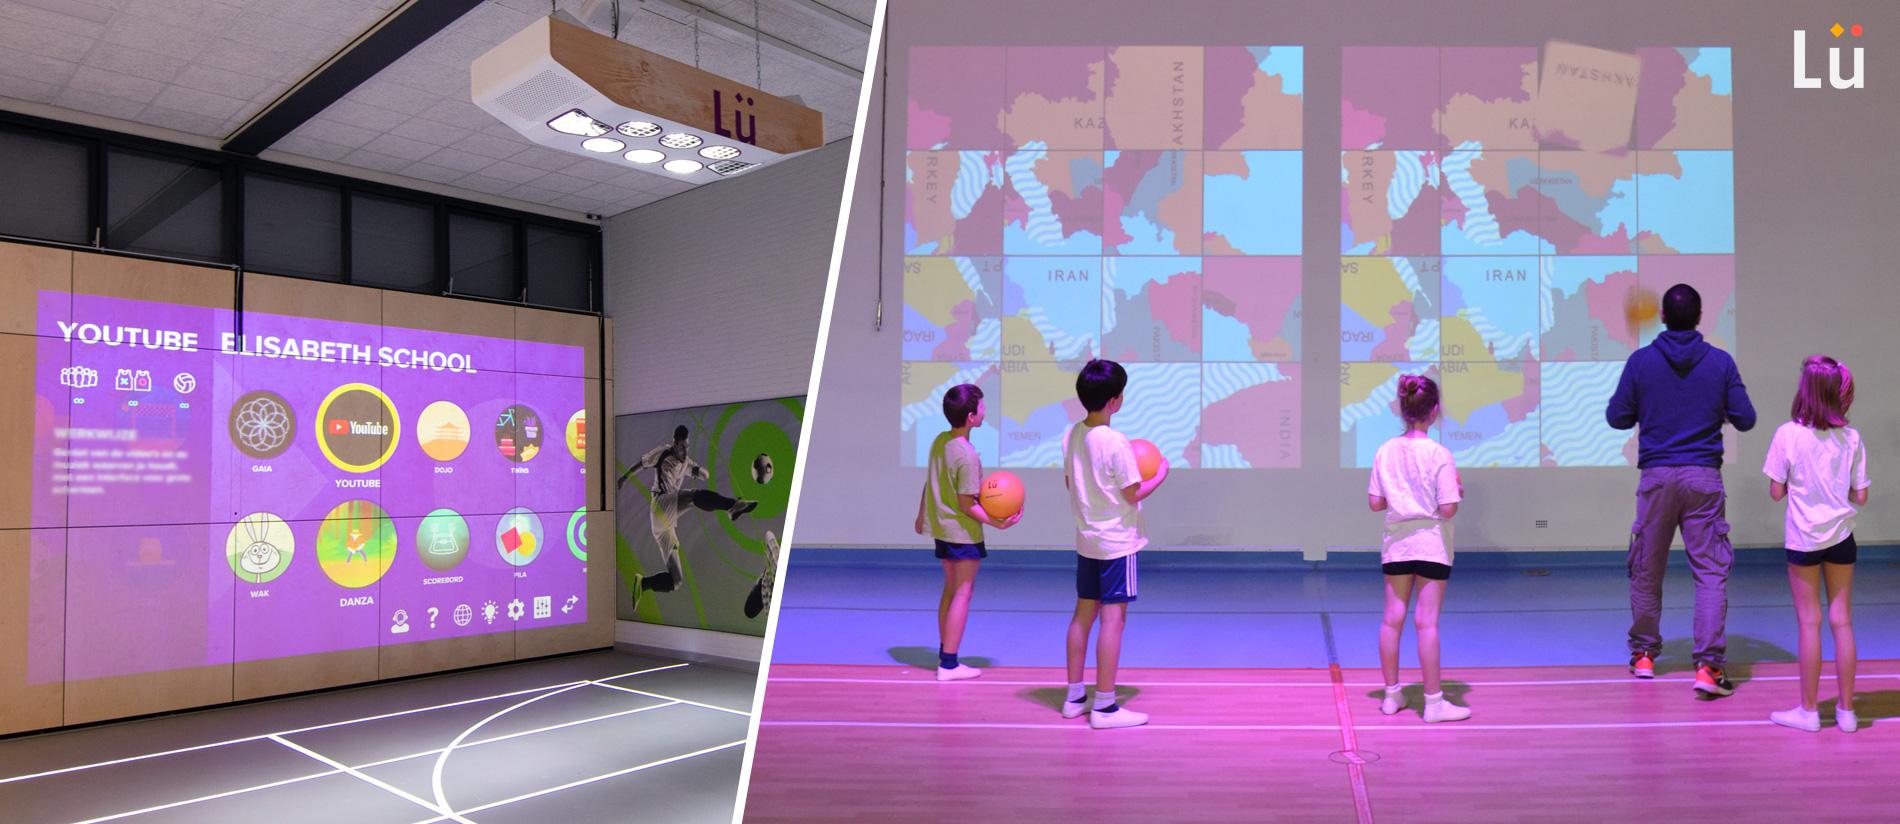 Lü gymnase interactif - Nos références